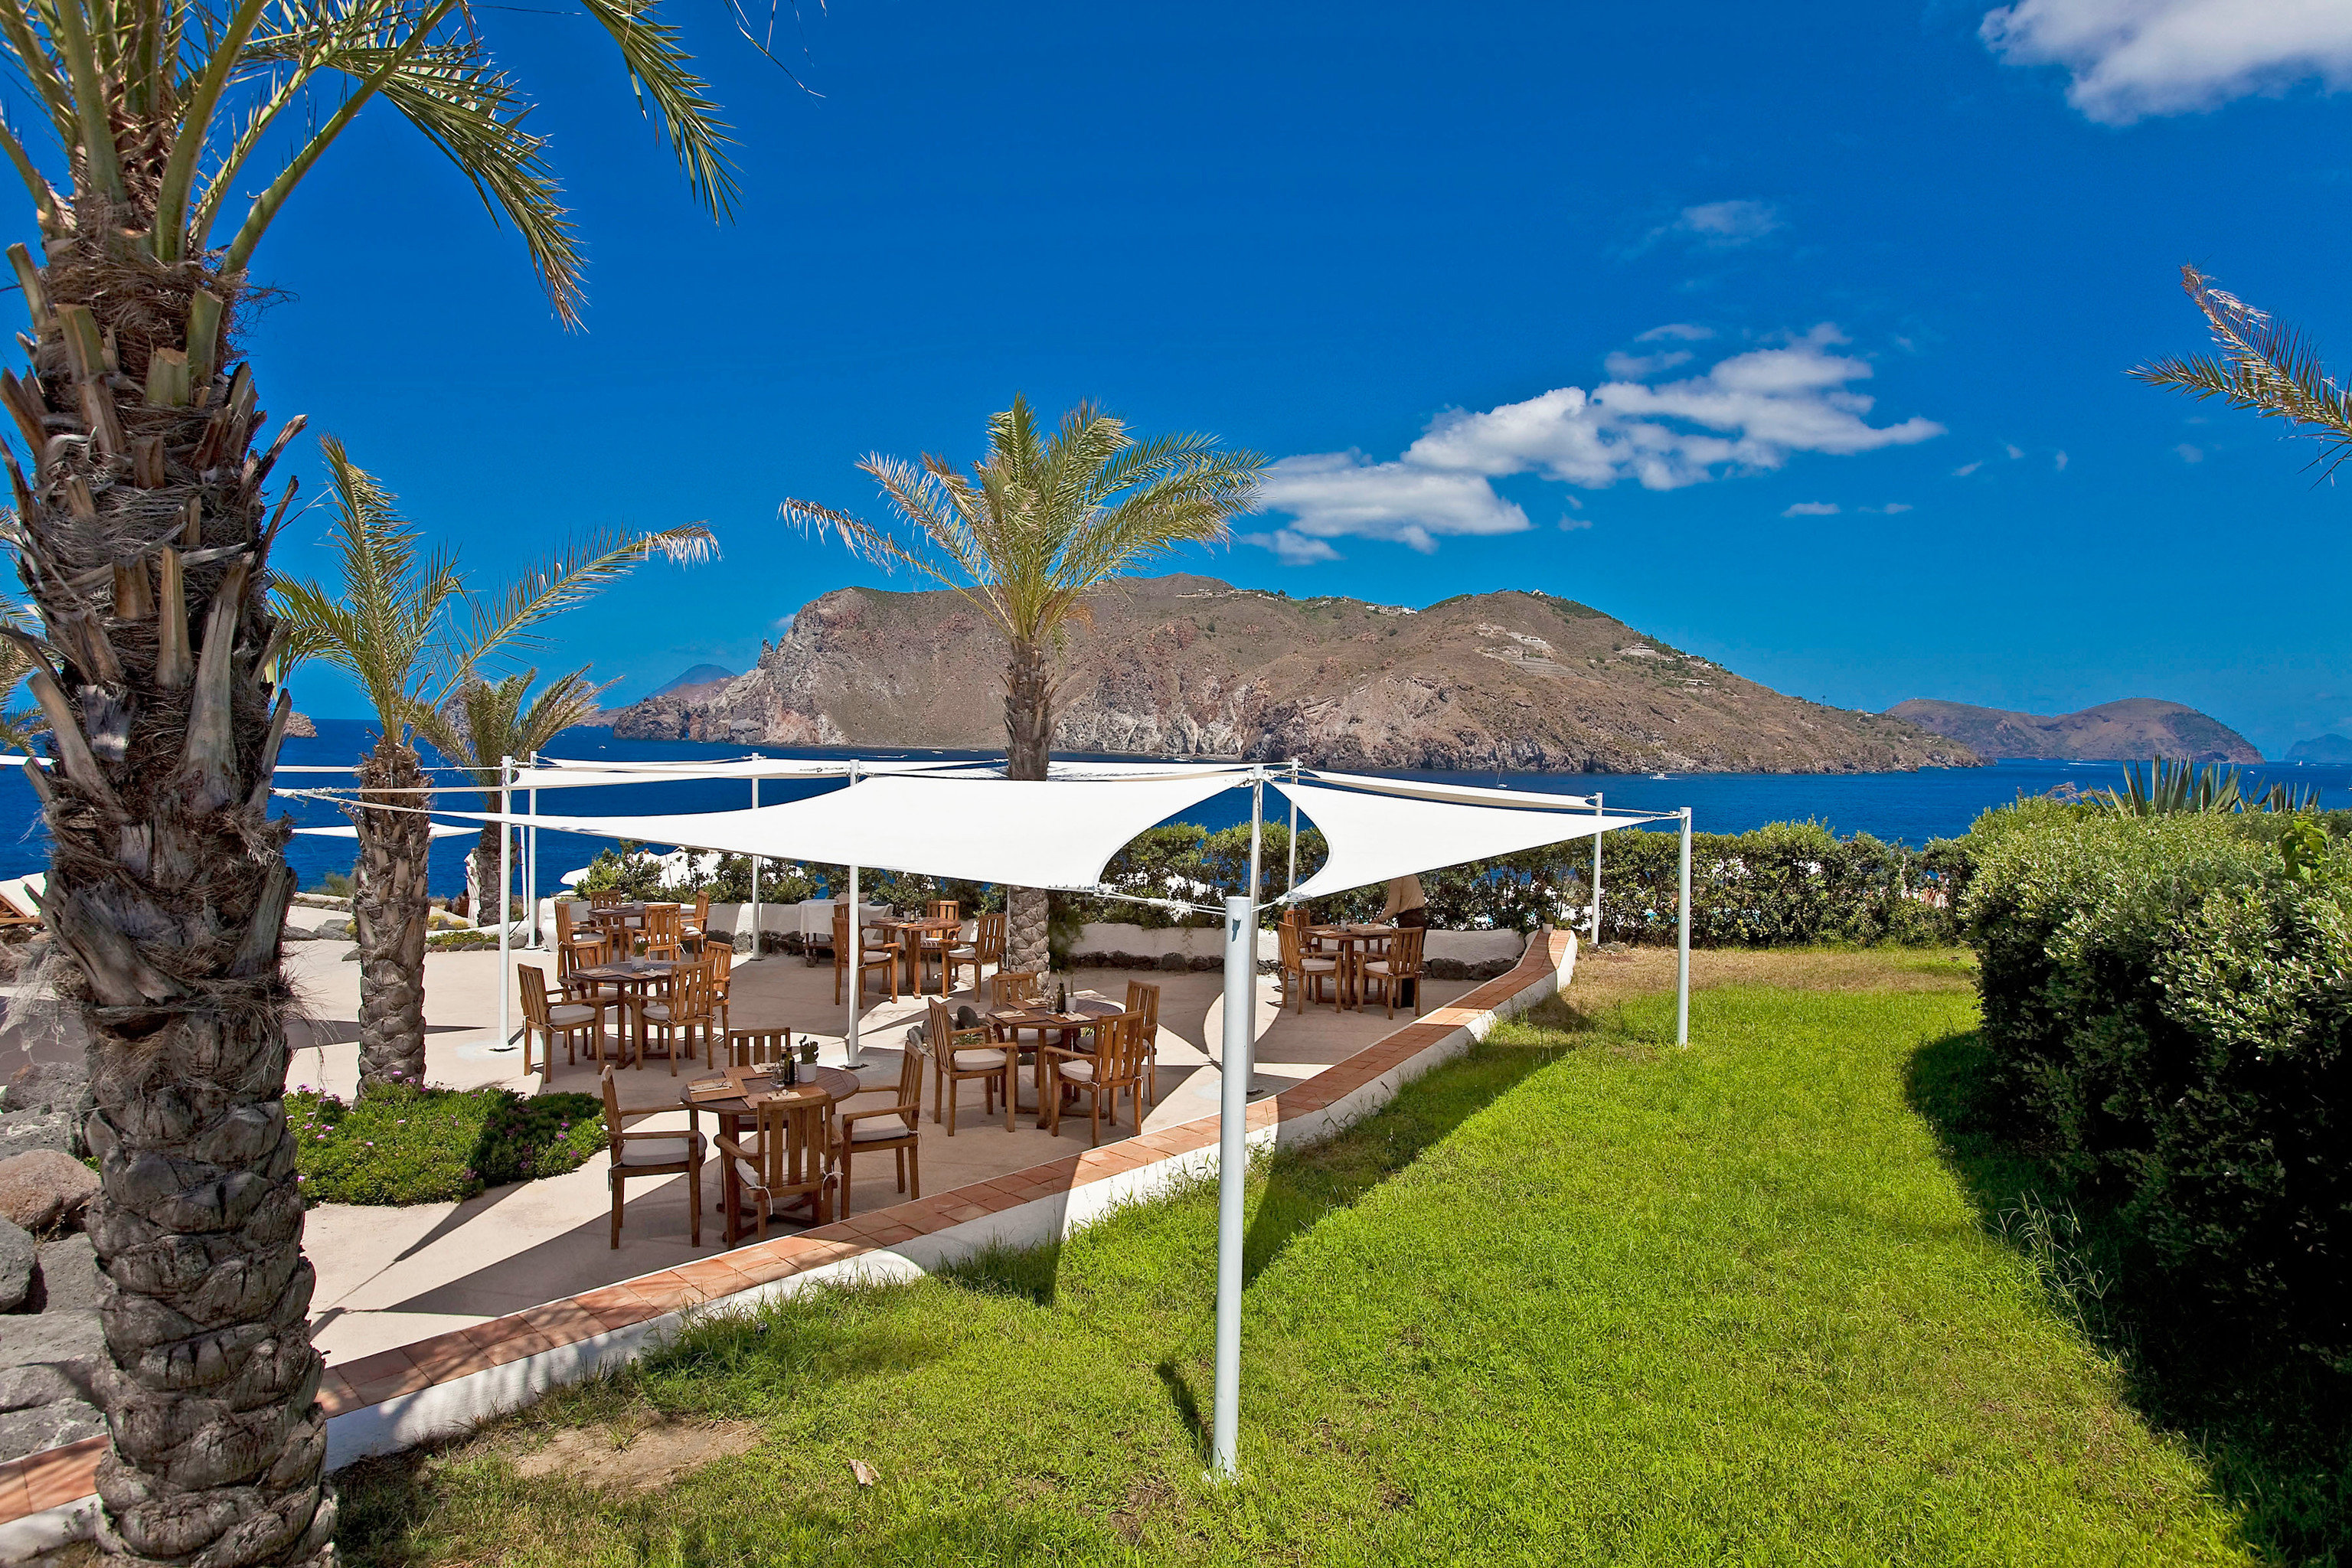 Beach Grounds Resort Romance Wellness grass tree sky property plant walkway Villa palm lush